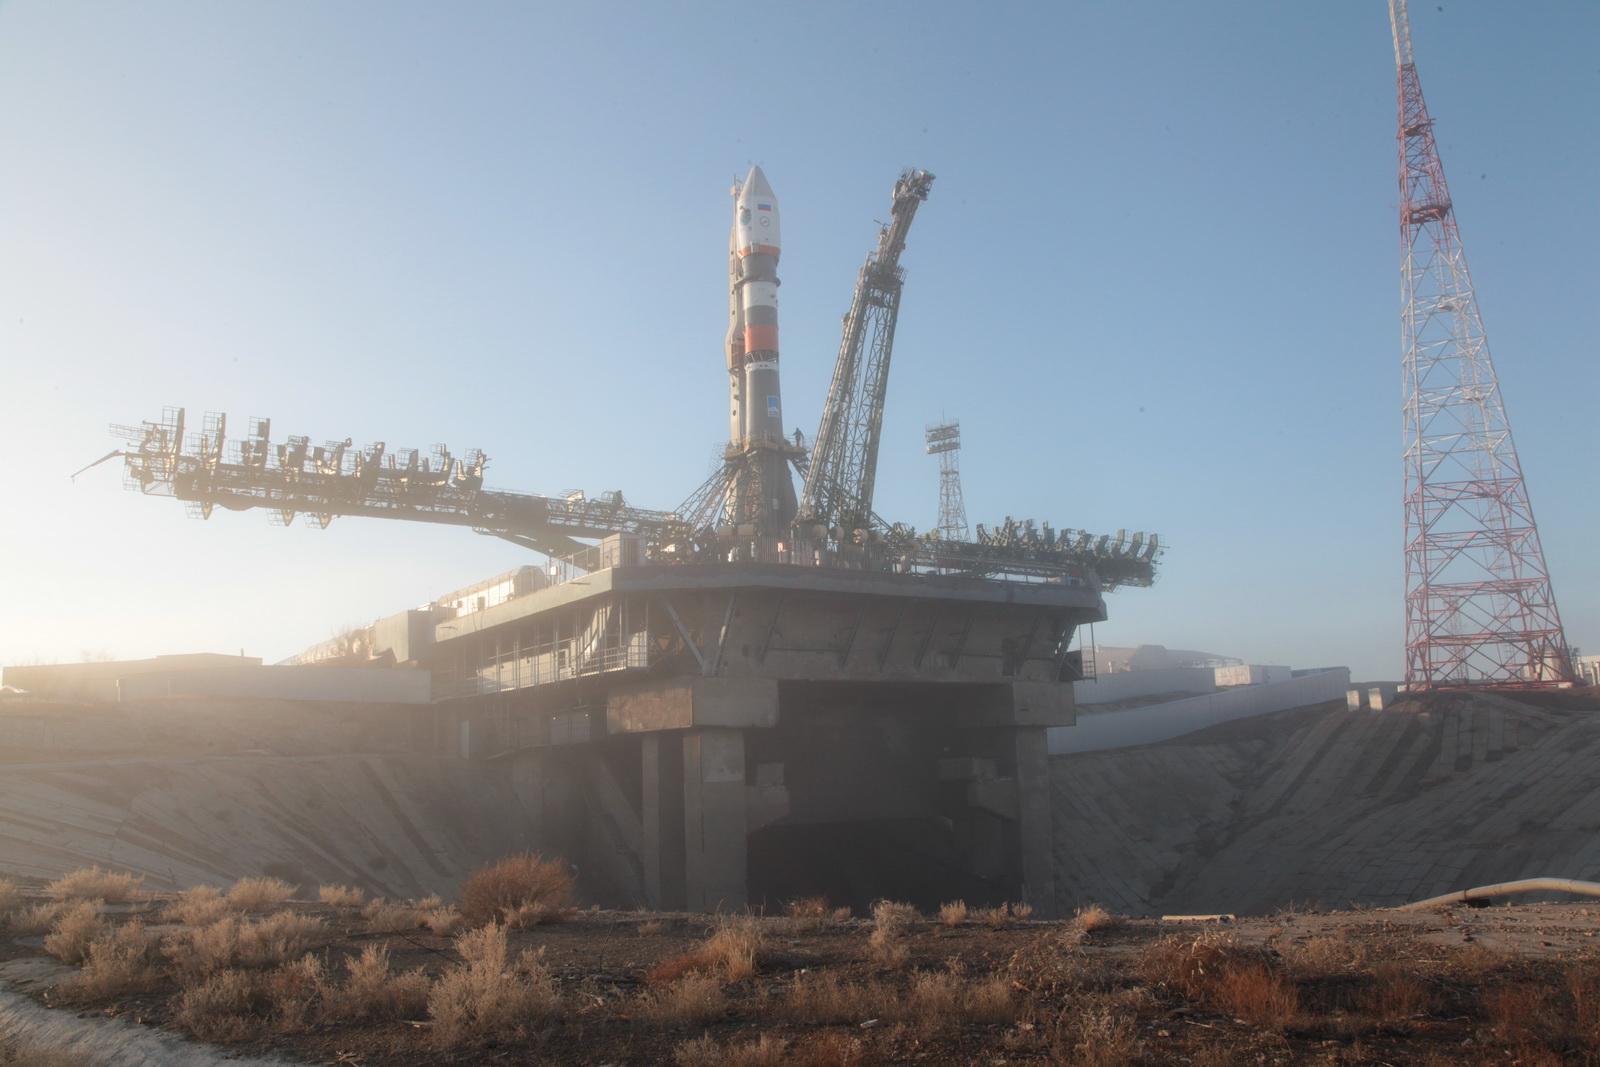 soyuz rocket rolls to baikonur launch pad to lift third